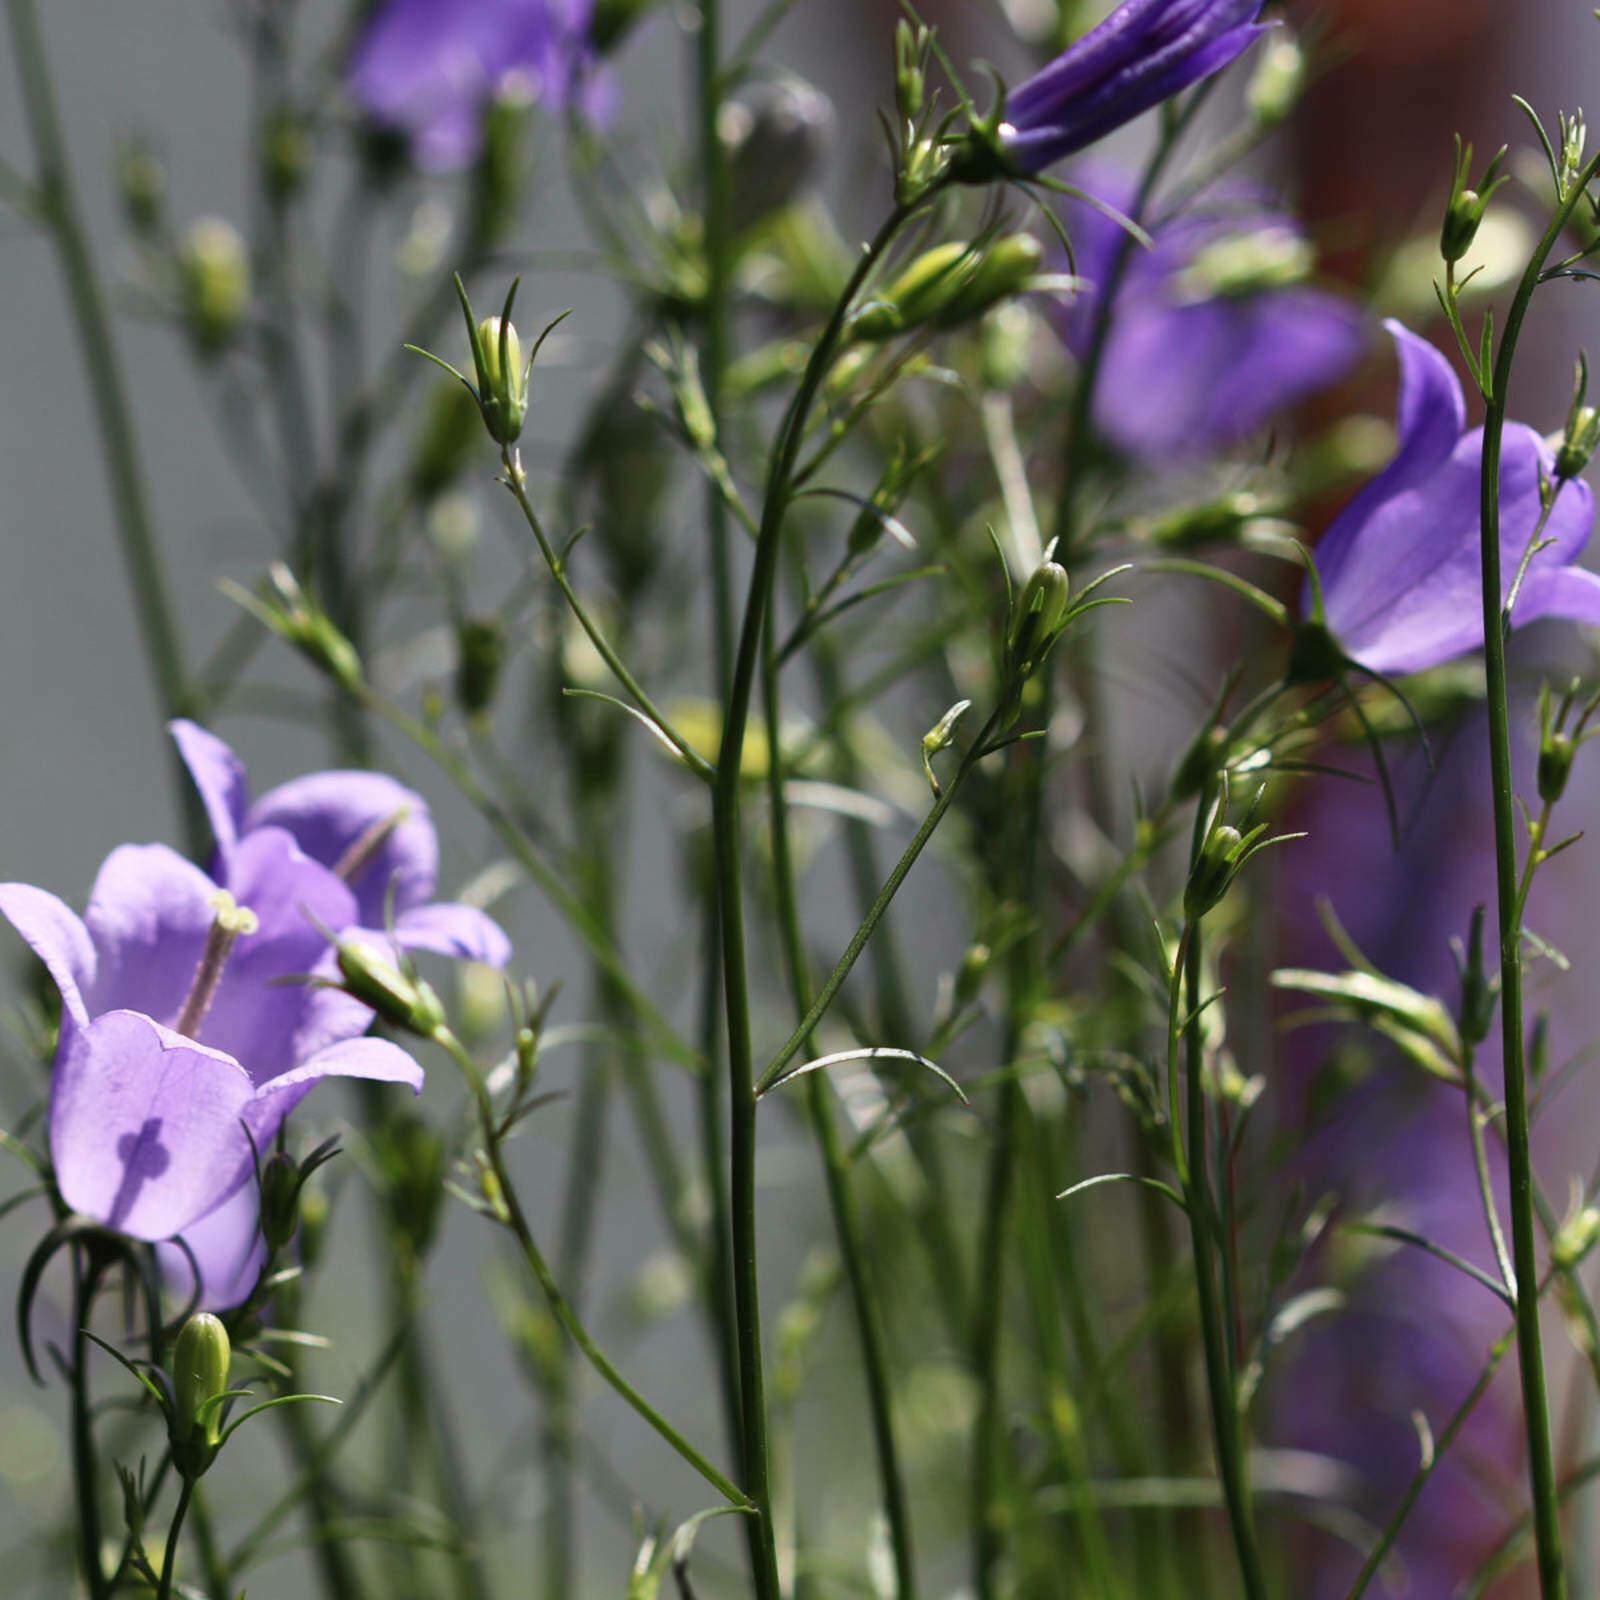 campanula-rotundifolia-1-insta.jpg